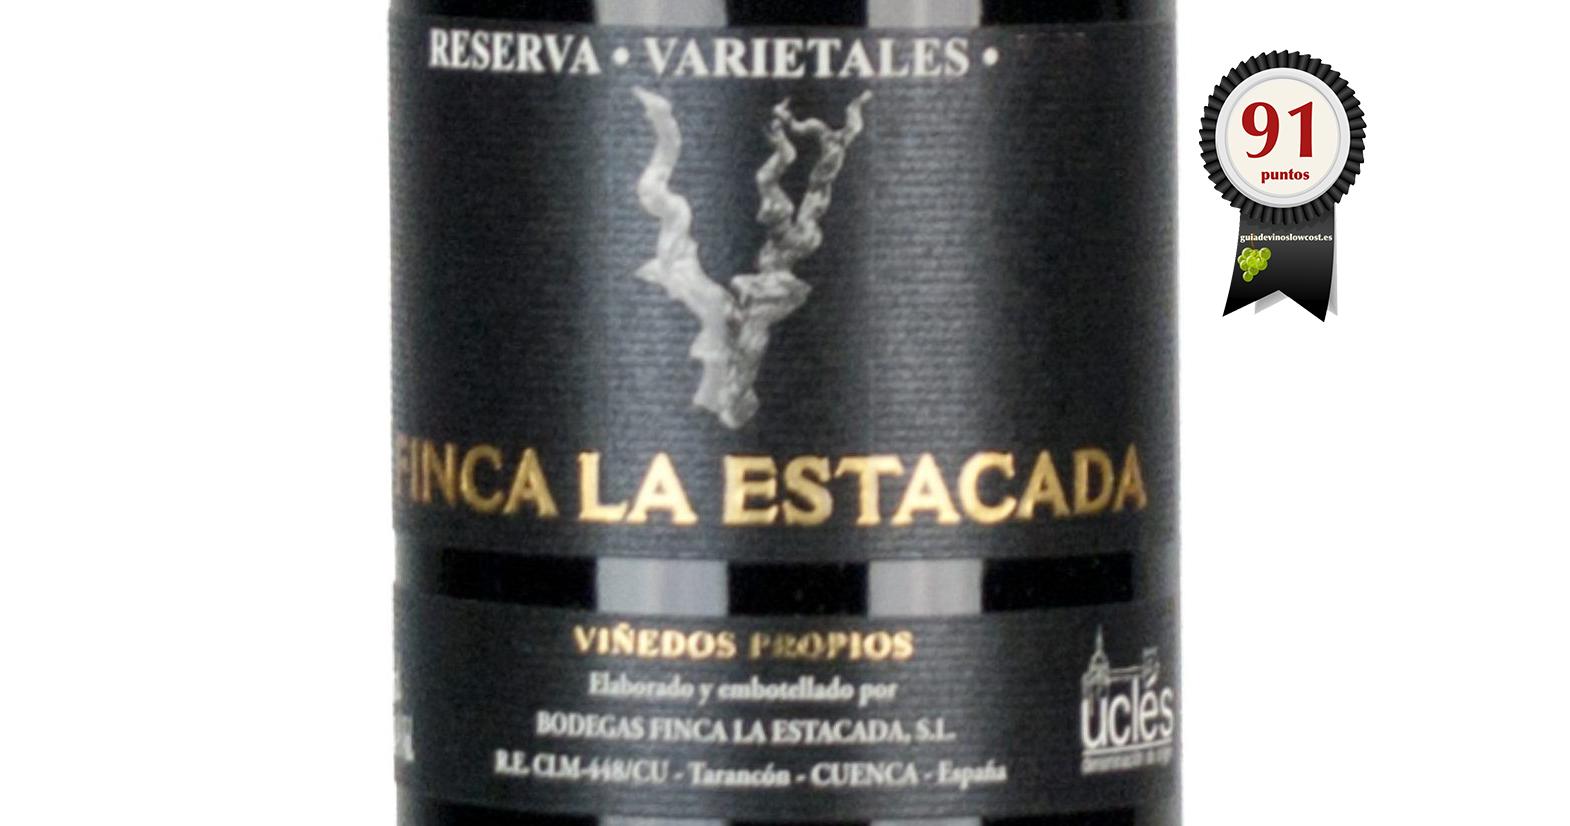 Finca La Estacada Varietales Rsva. 2014